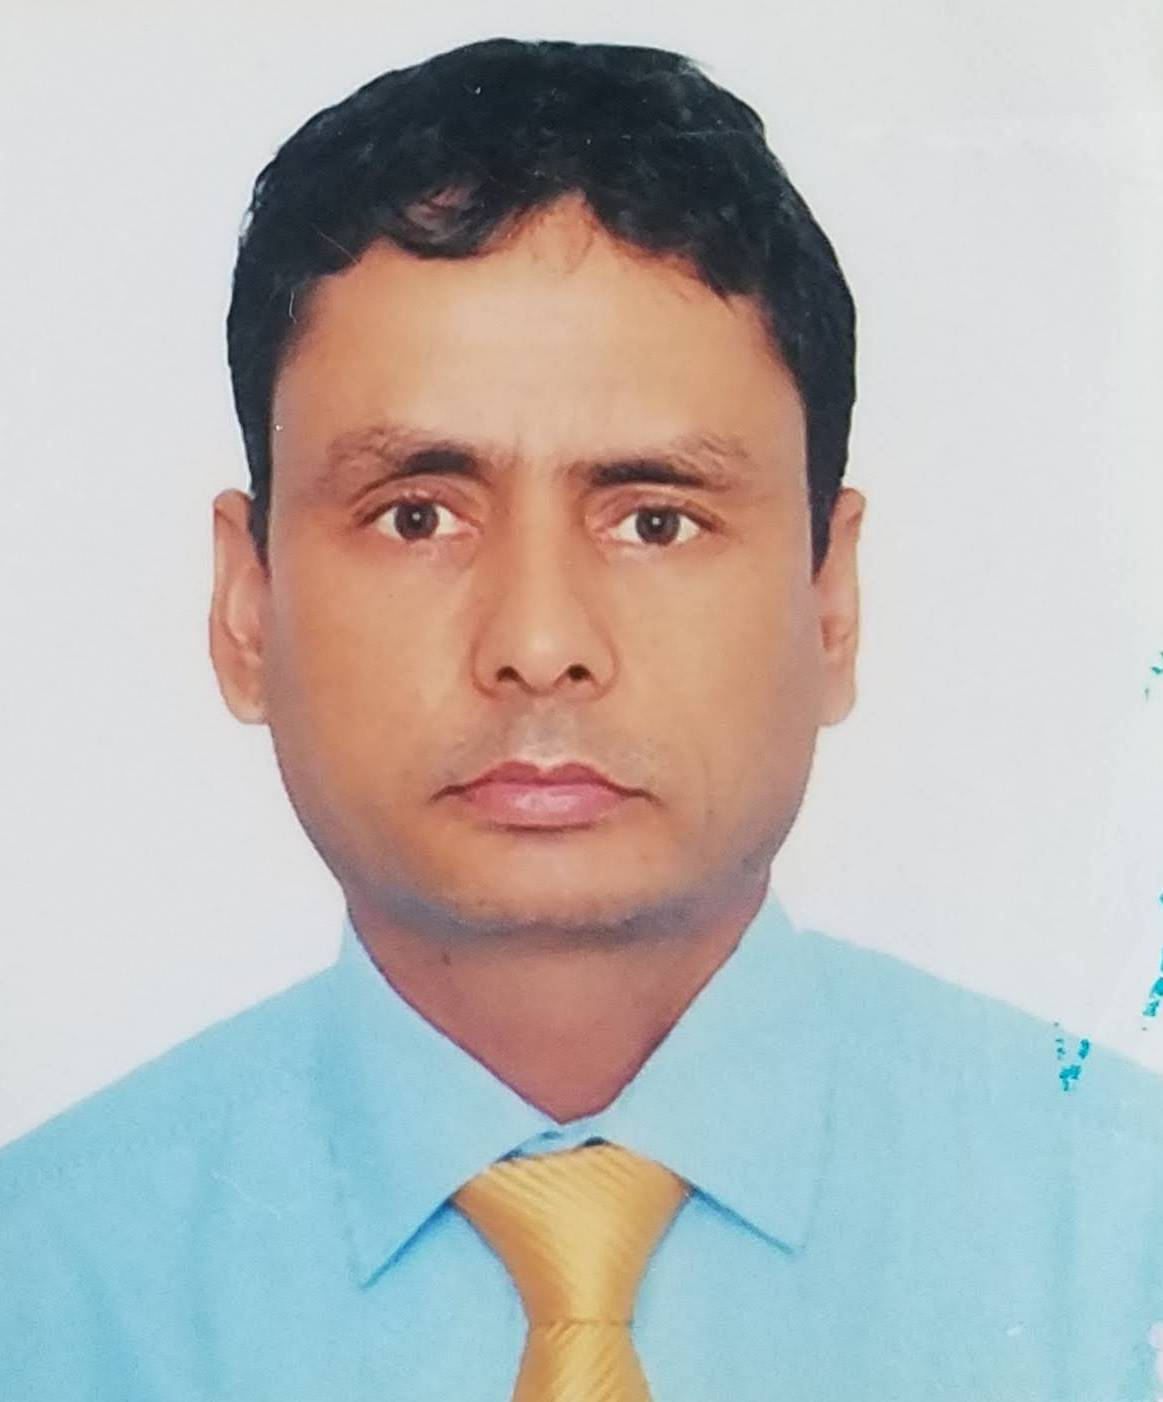 Dr. Mahadev Pd. Poudel